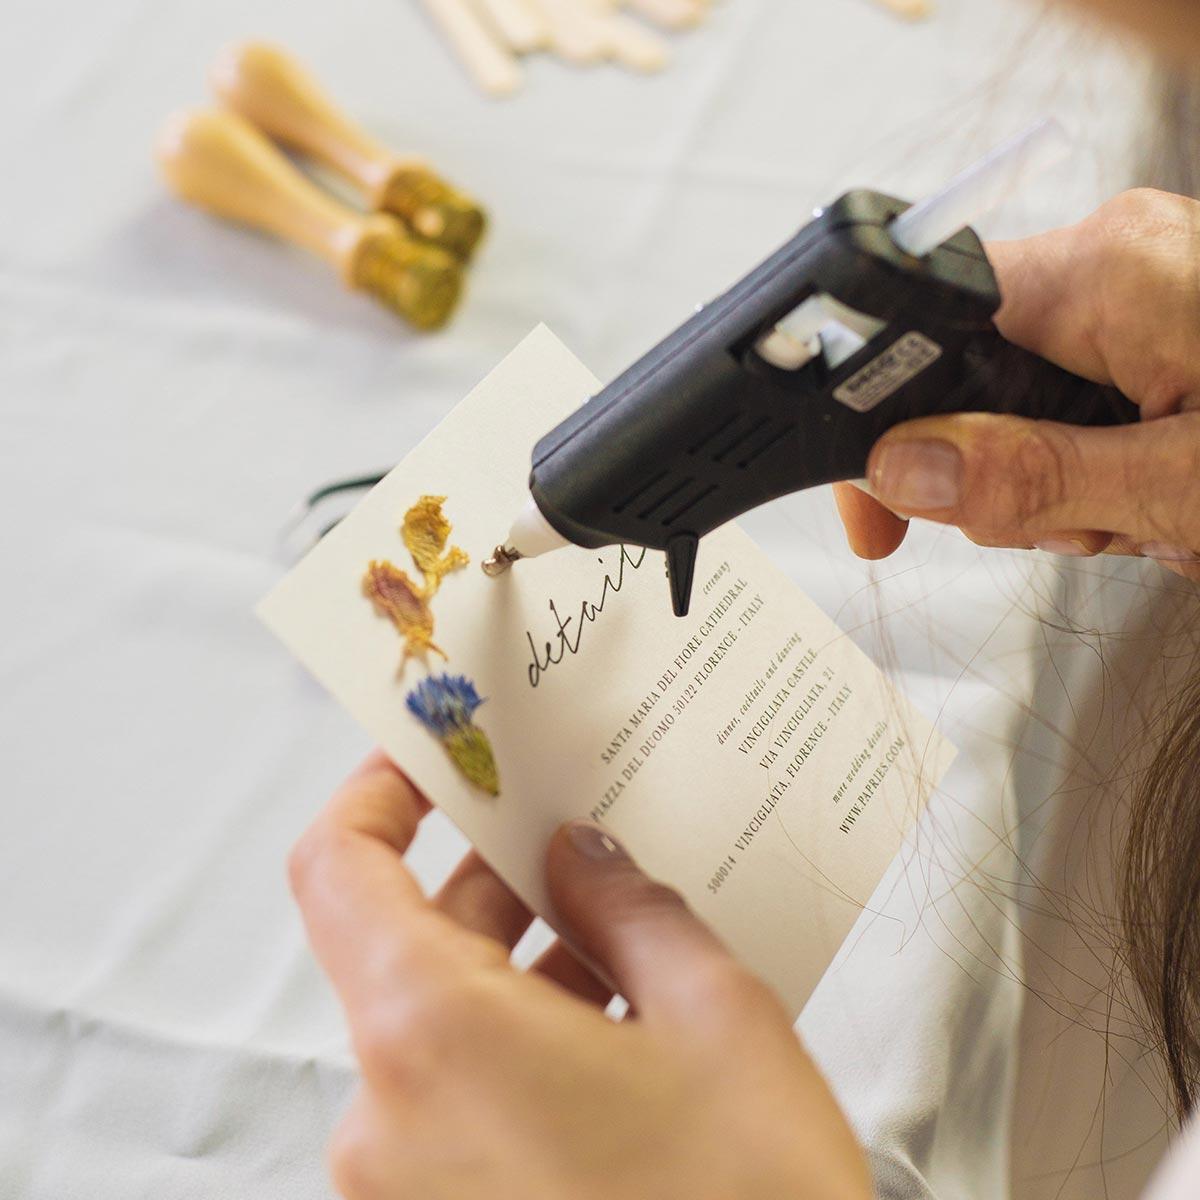 Partecipazioni Matrimonio Firenze.Papries Hand Made Inviti Partecipazioni Matrimonio Primavera